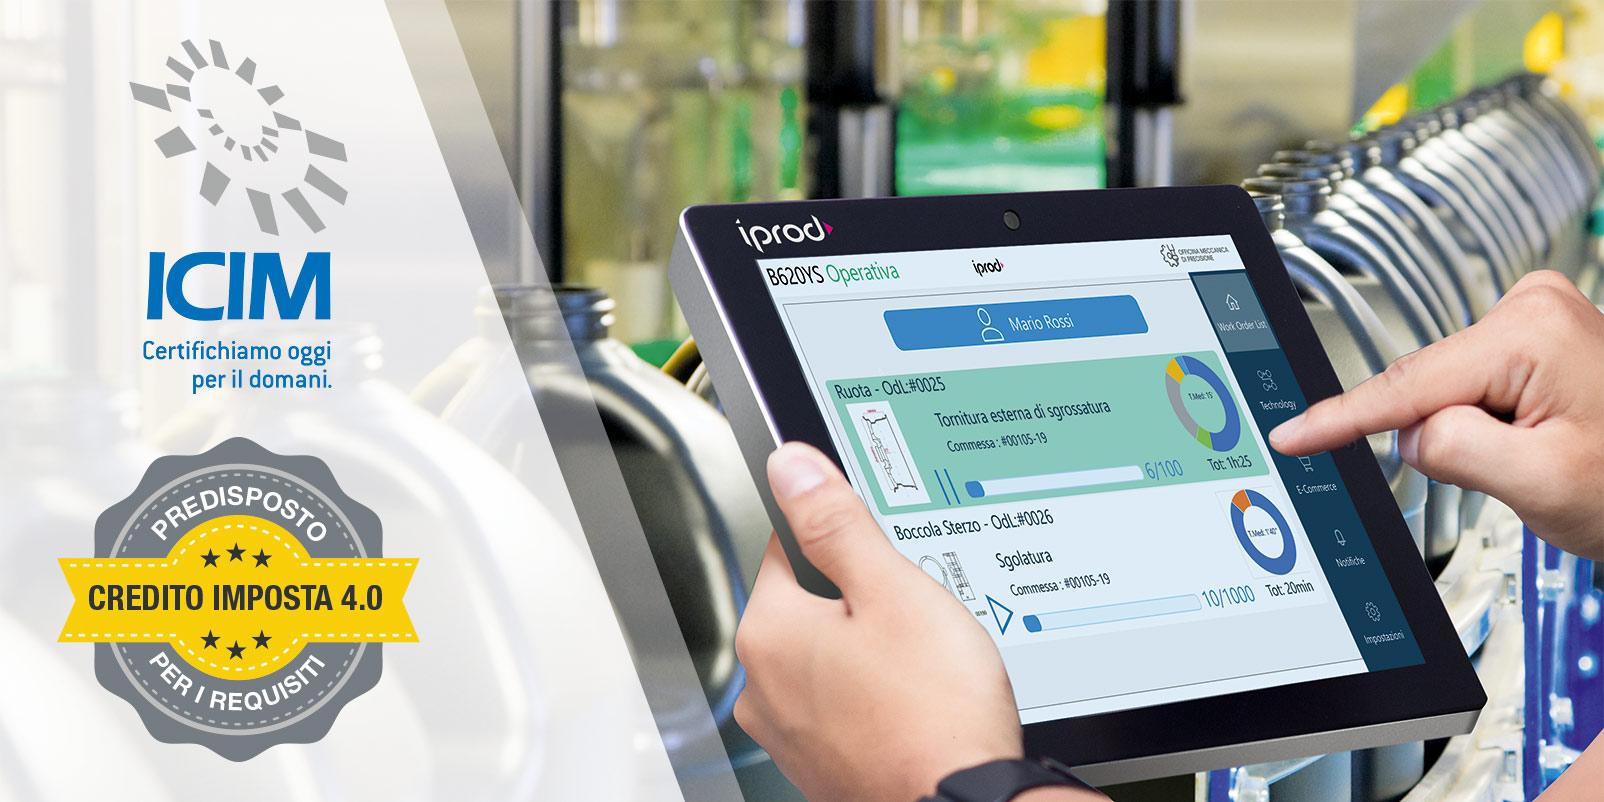 iprod-iot-tablet-catena-montaggio-credito-imposta-icim-1